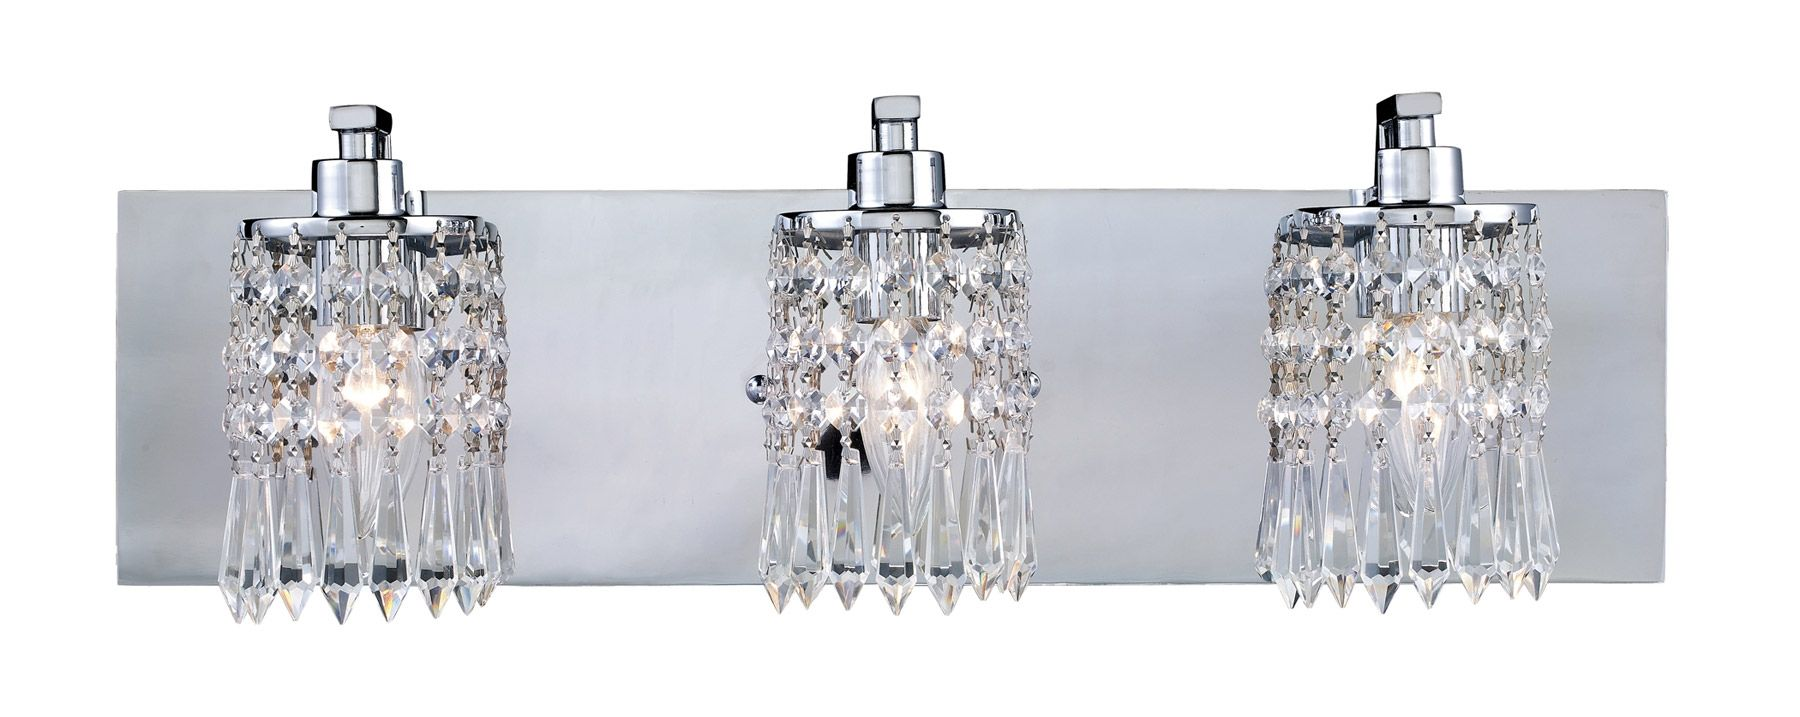 Crystal Vanity Lights For Bathroom  Bathroom Ideas  Pinterest Alluring Crystal Vanity Lights For Bathroom Inspiration